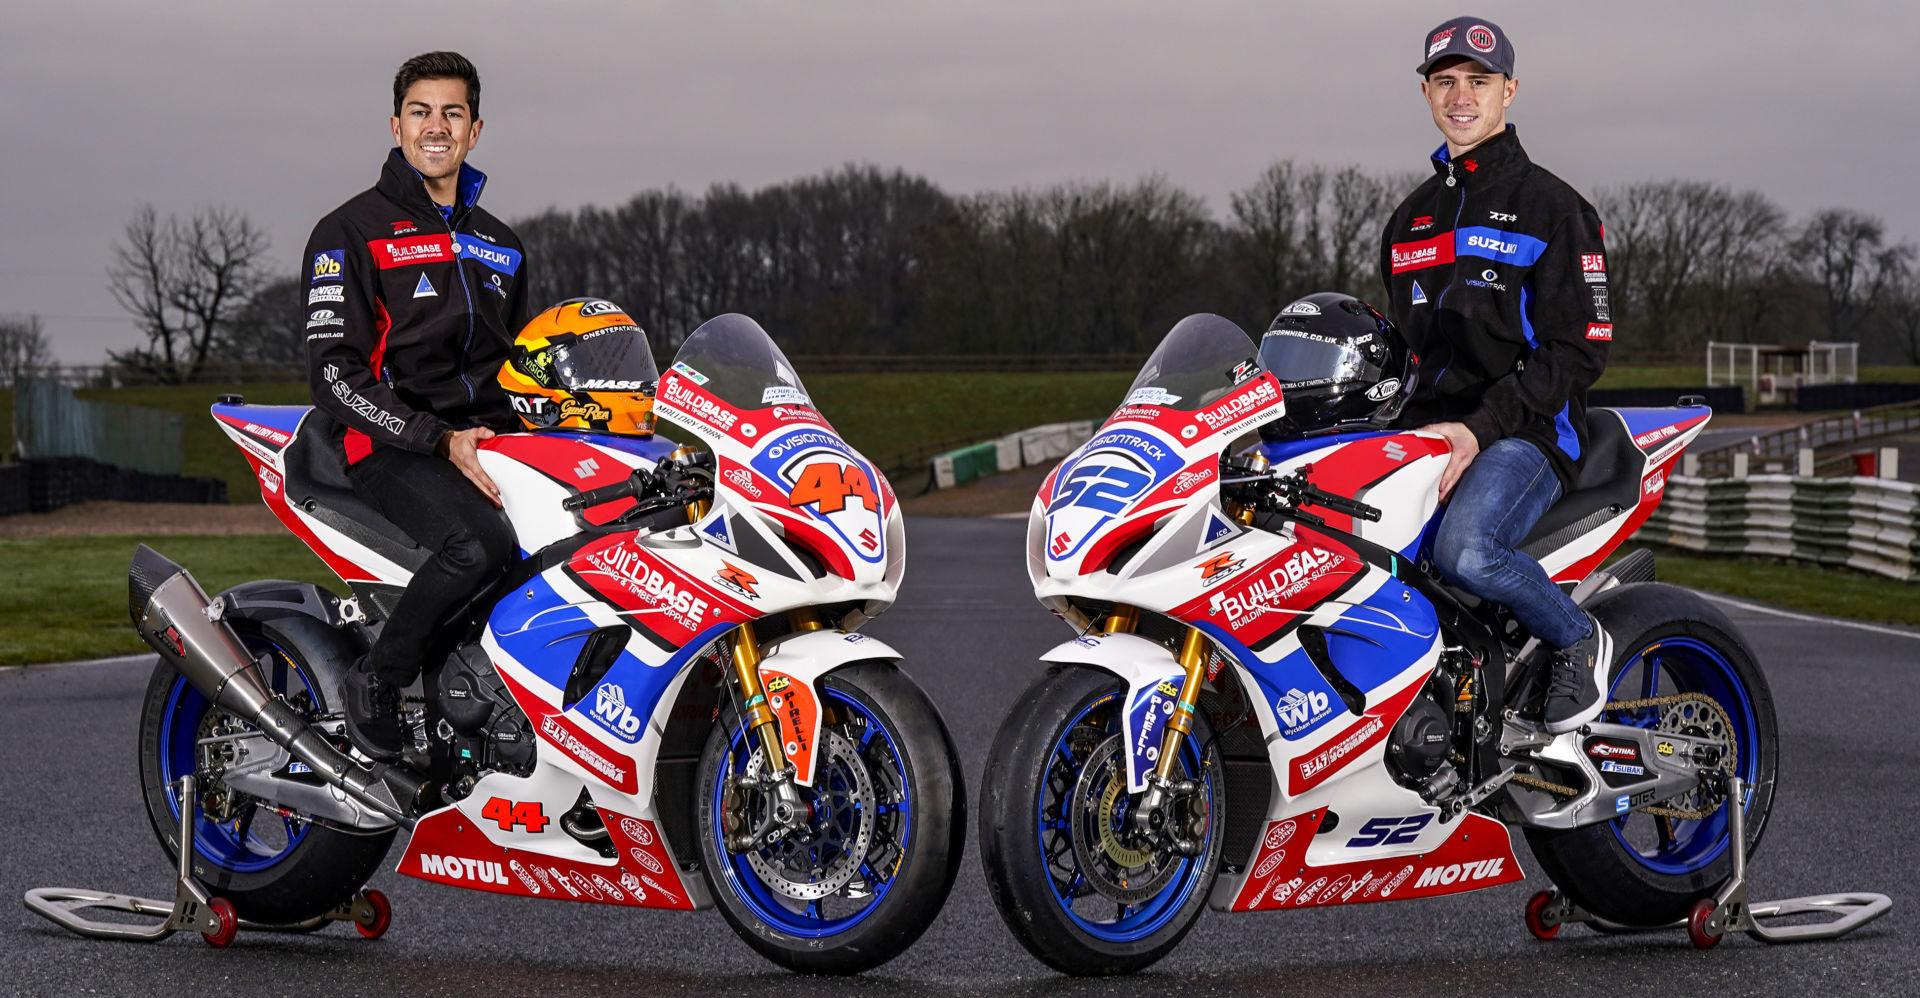 Gino Rea (left) and Danny Kent (right). Photo courtesy Team Suzuki News Service.